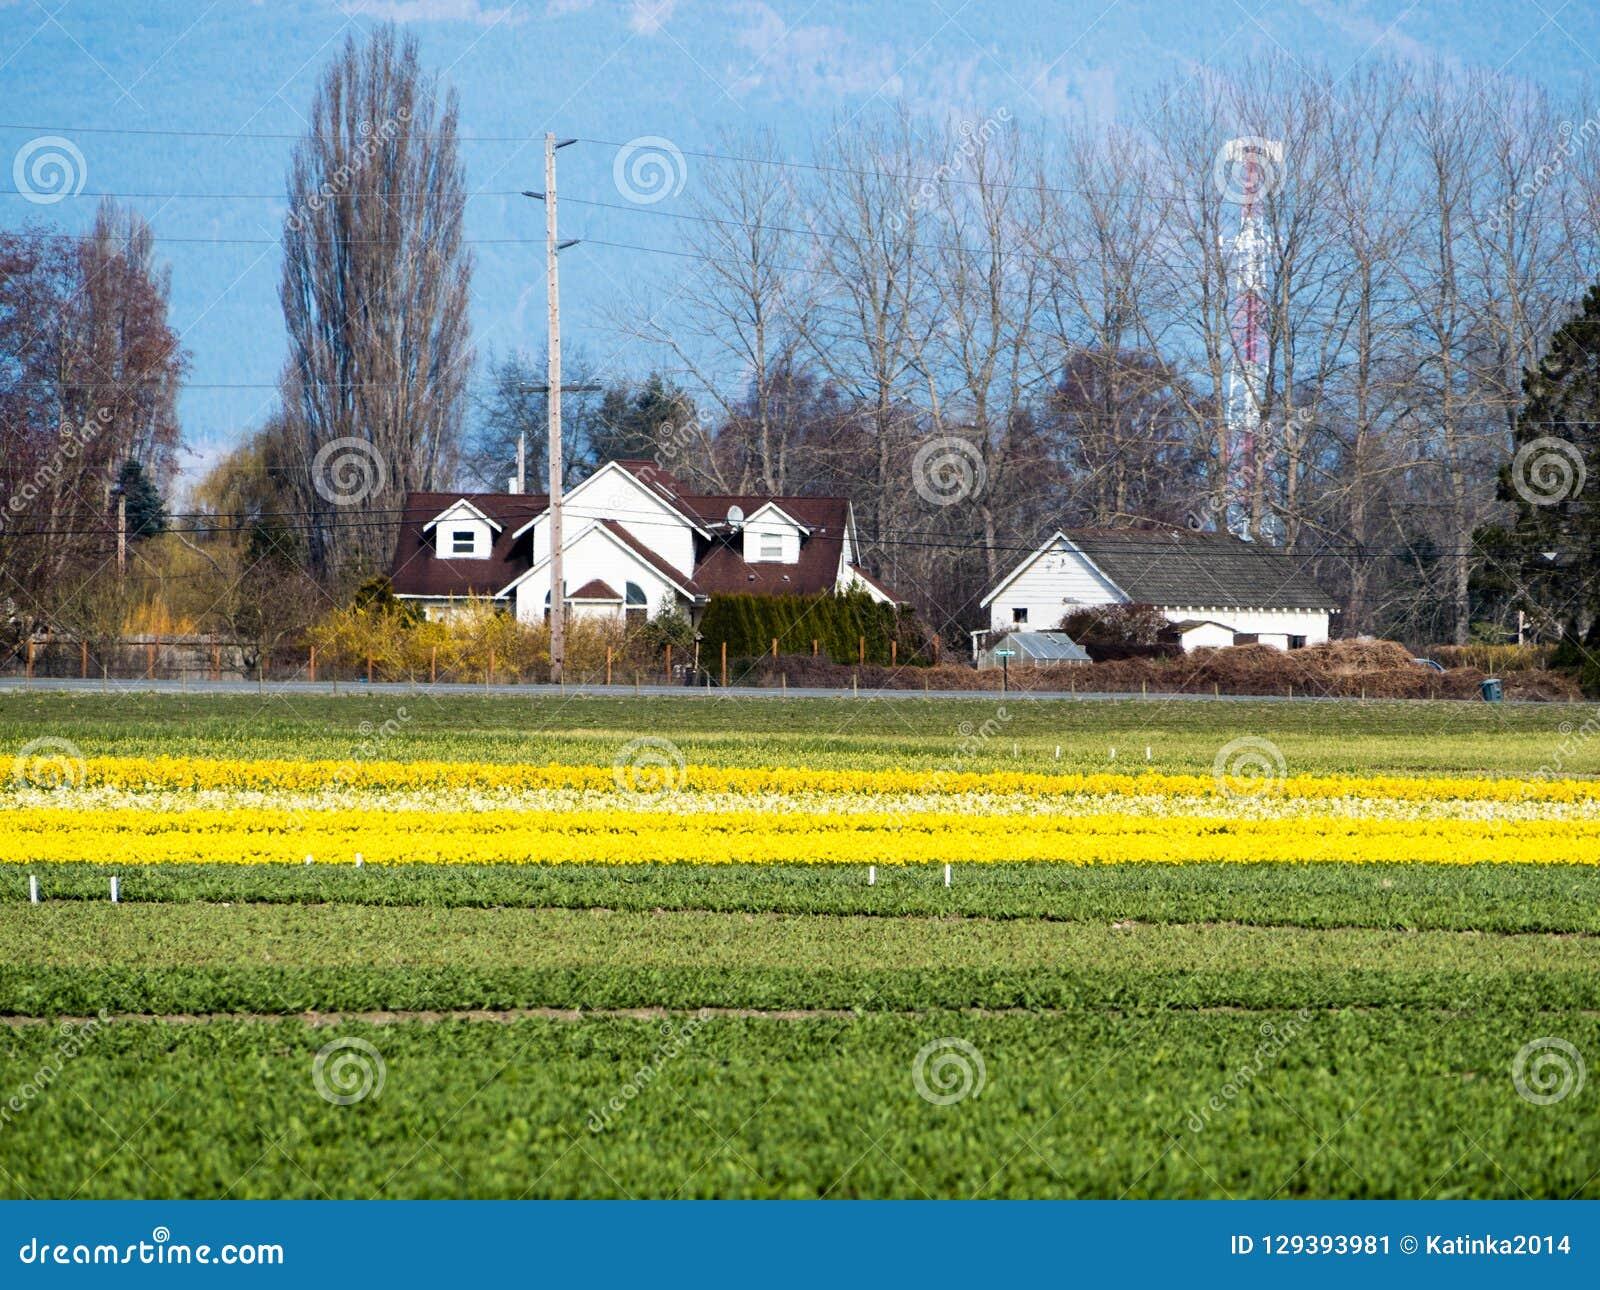 Farmlands with daffodil fields in Washington state, USA